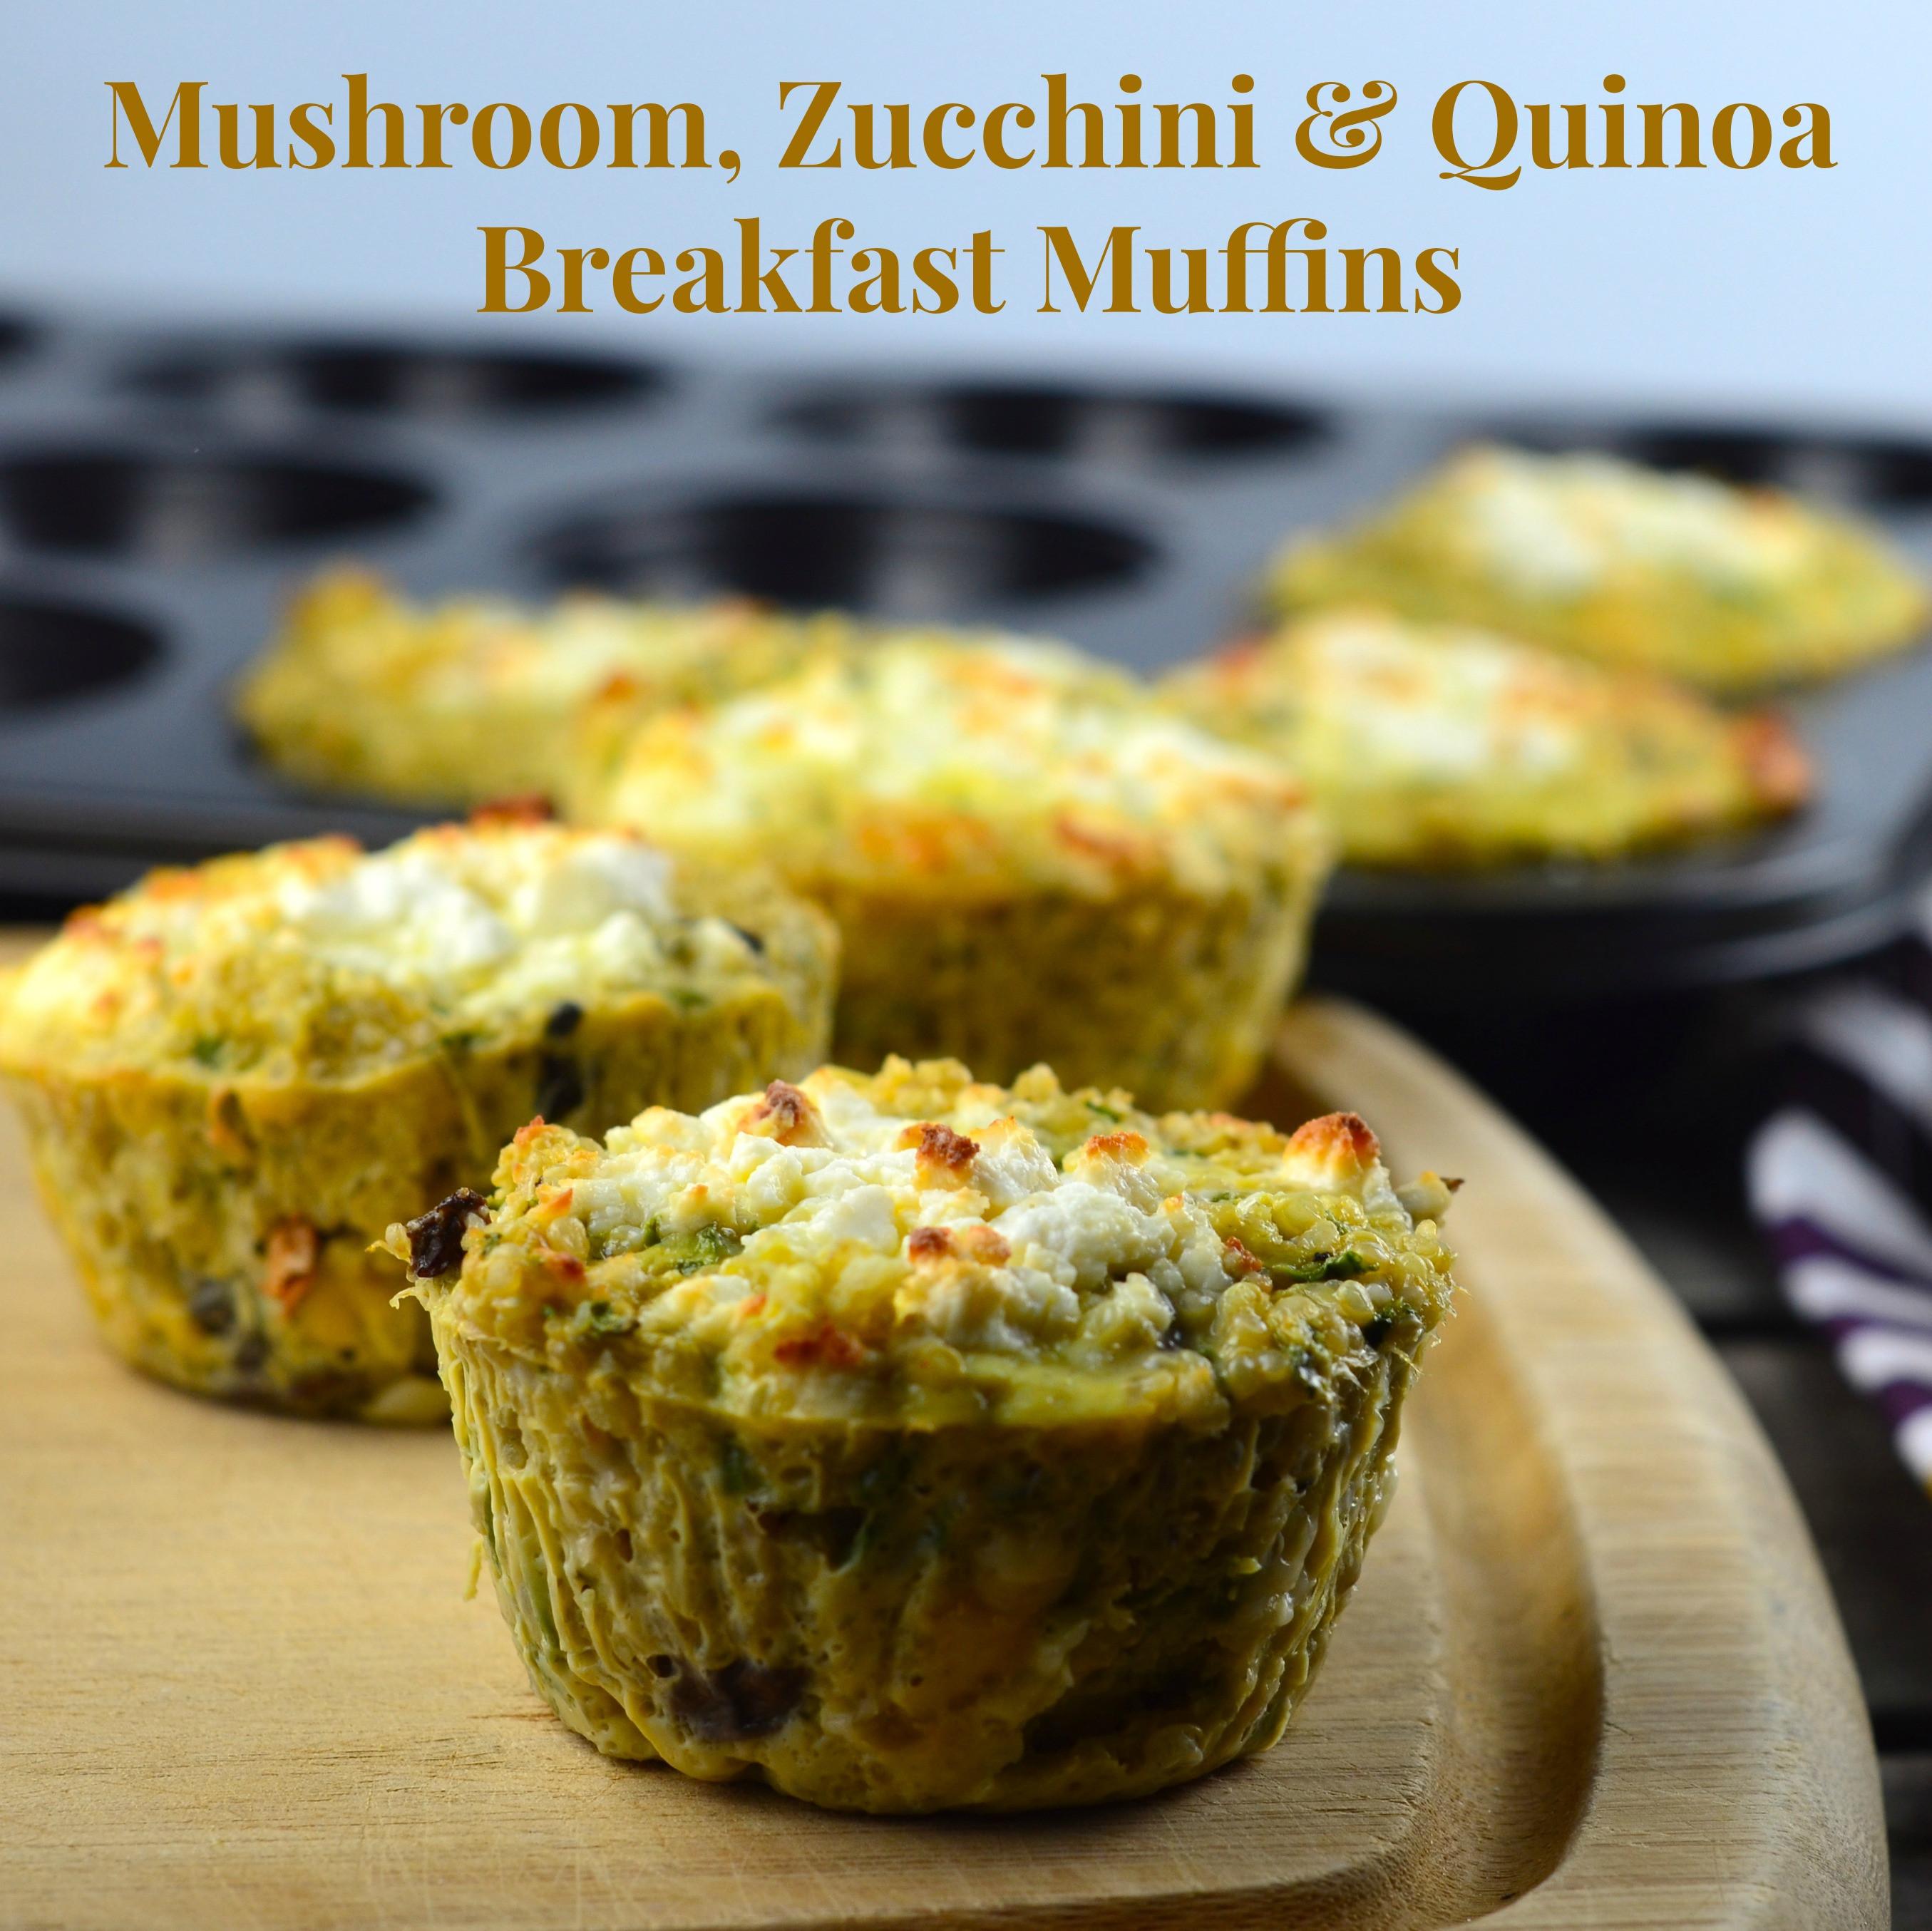 Vegetarian Muffin Tin Recipes  Passover Recipes Mushroom Zucchini & Quinoa Breakfast